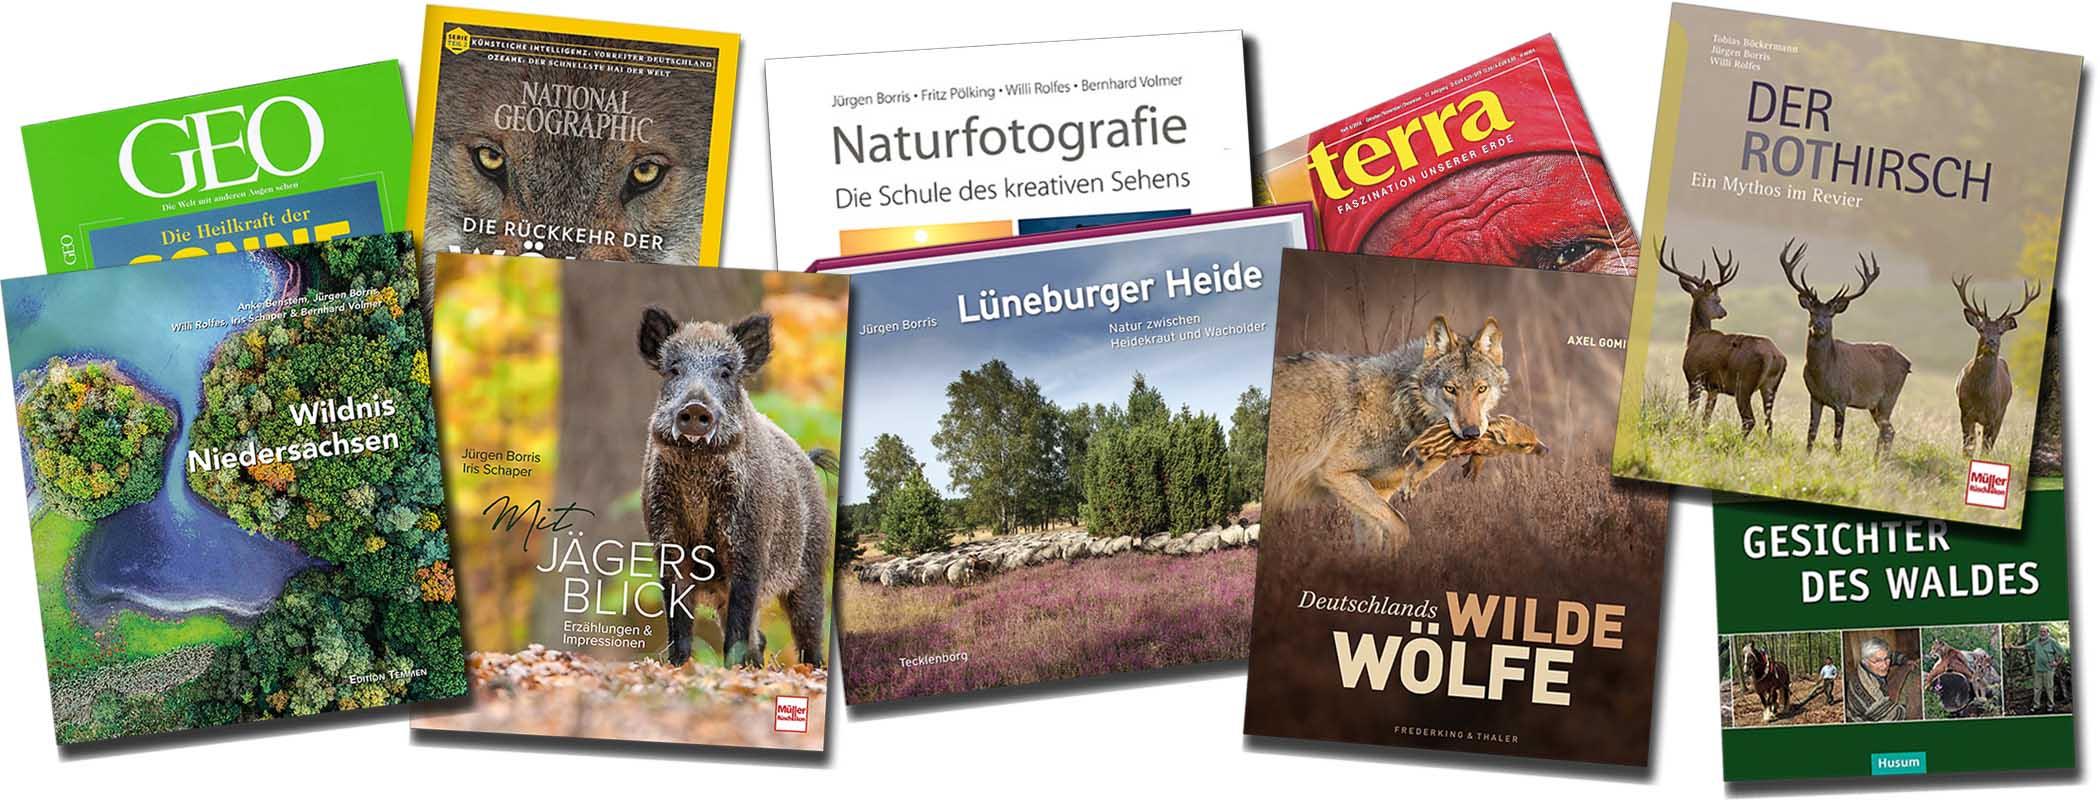 Publikationen des Naturfotografen Jürgen Borris